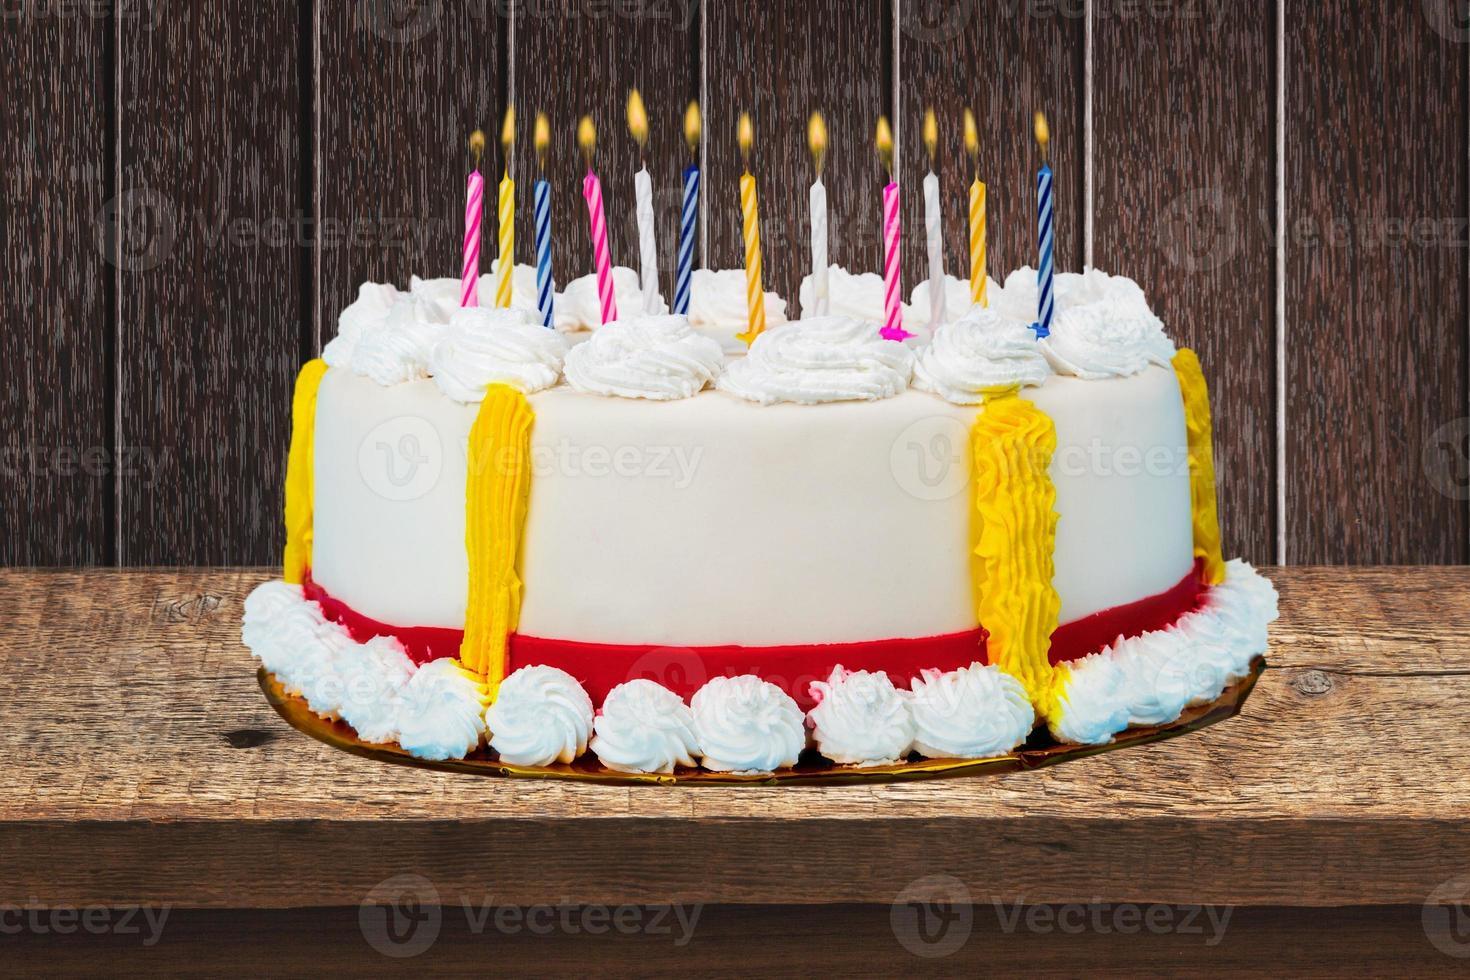 anniversaire, gâteau d'anniversaire, gâteau photo